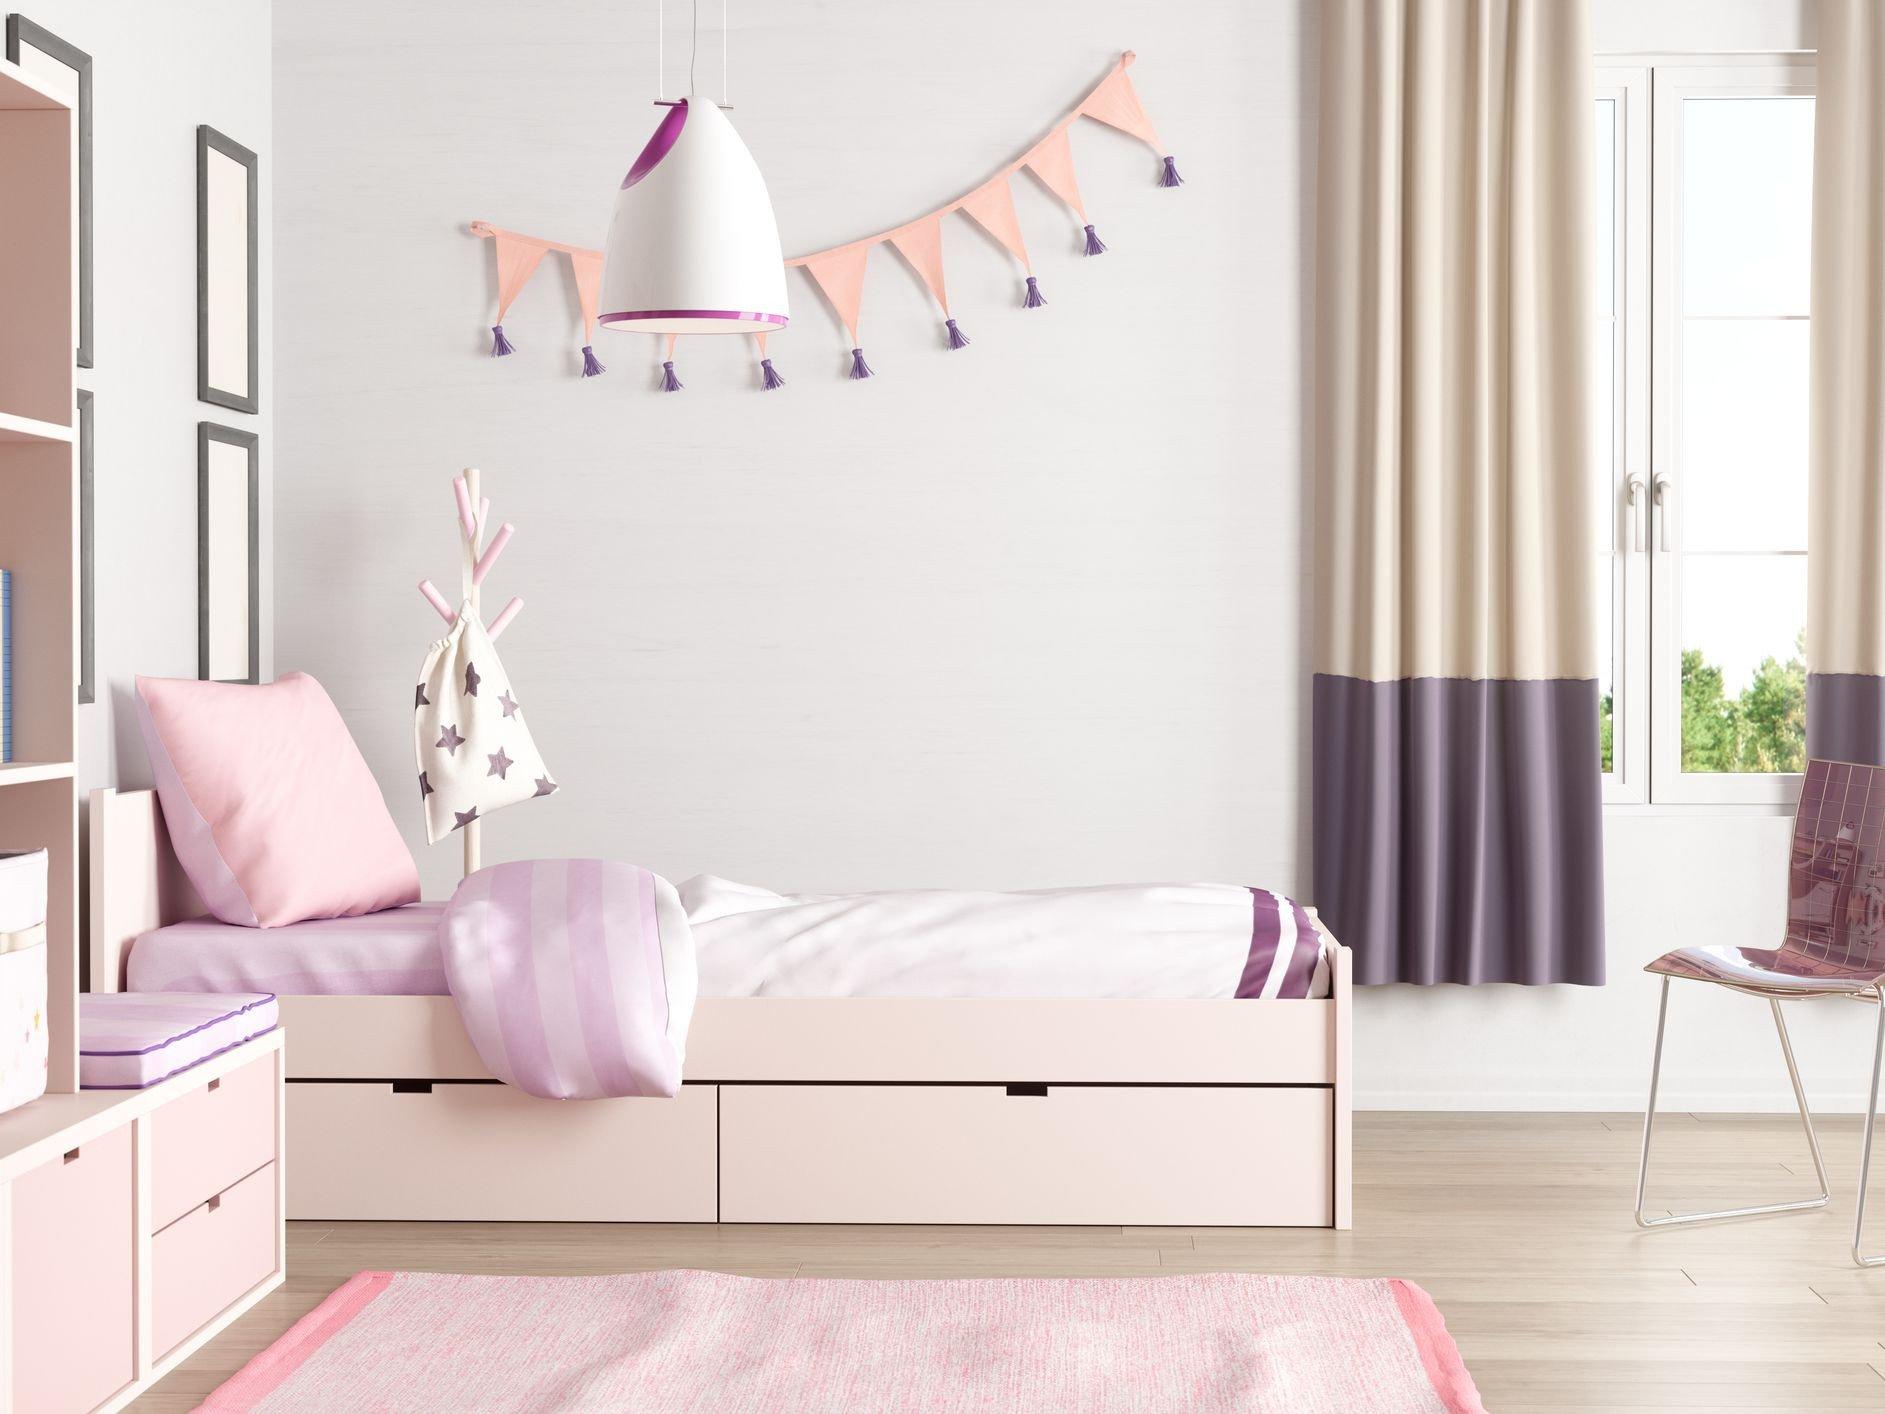 Teen Bedroom Wall Decor Inspirational Bud Decorating Ideas for Teenage Bedrooms